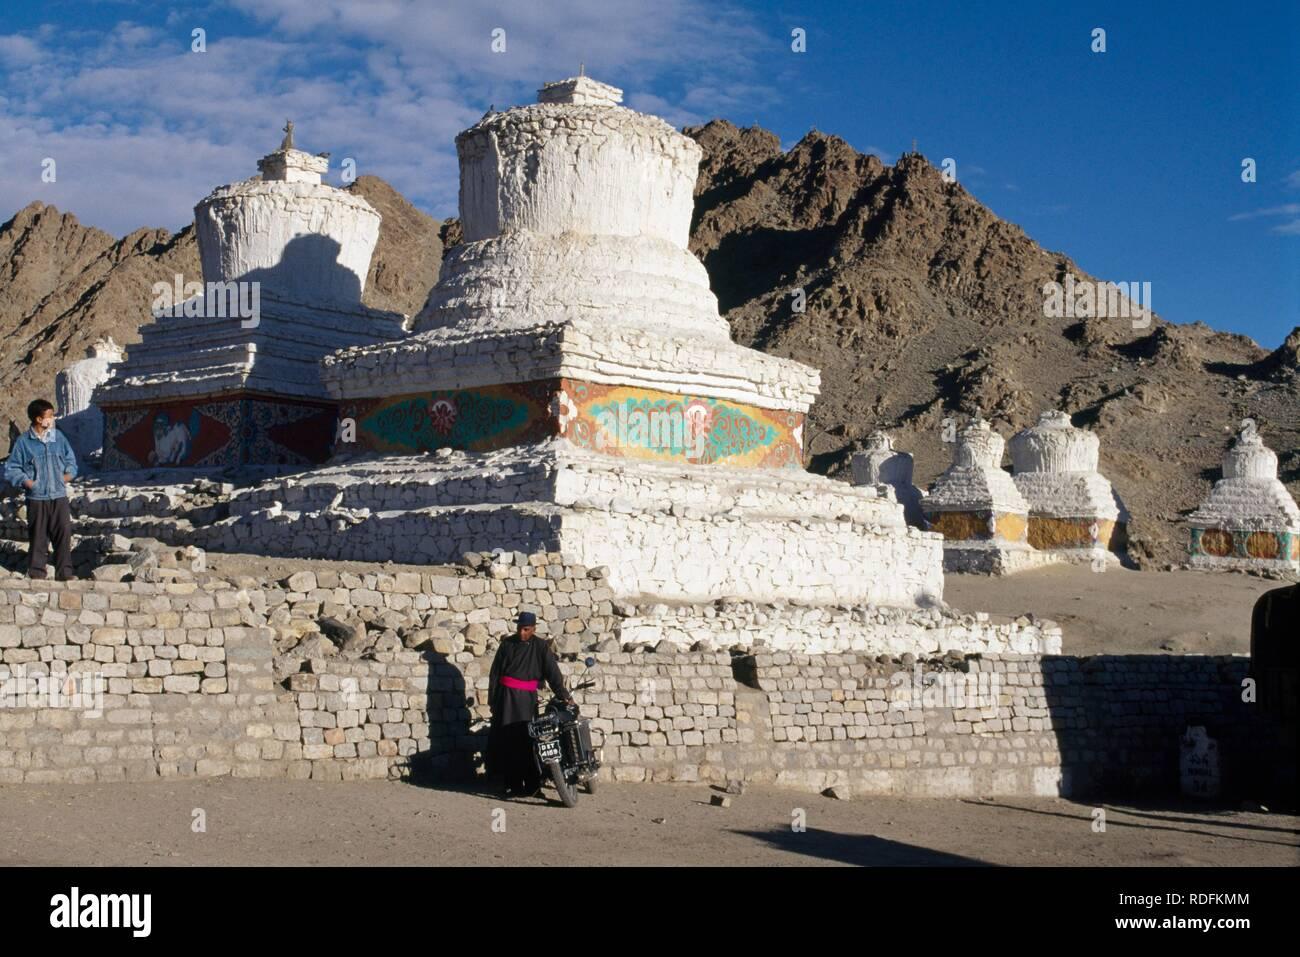 Stupa in Leh, Ladakh, Jammu and Kashmir, India, Asia Stock Photo